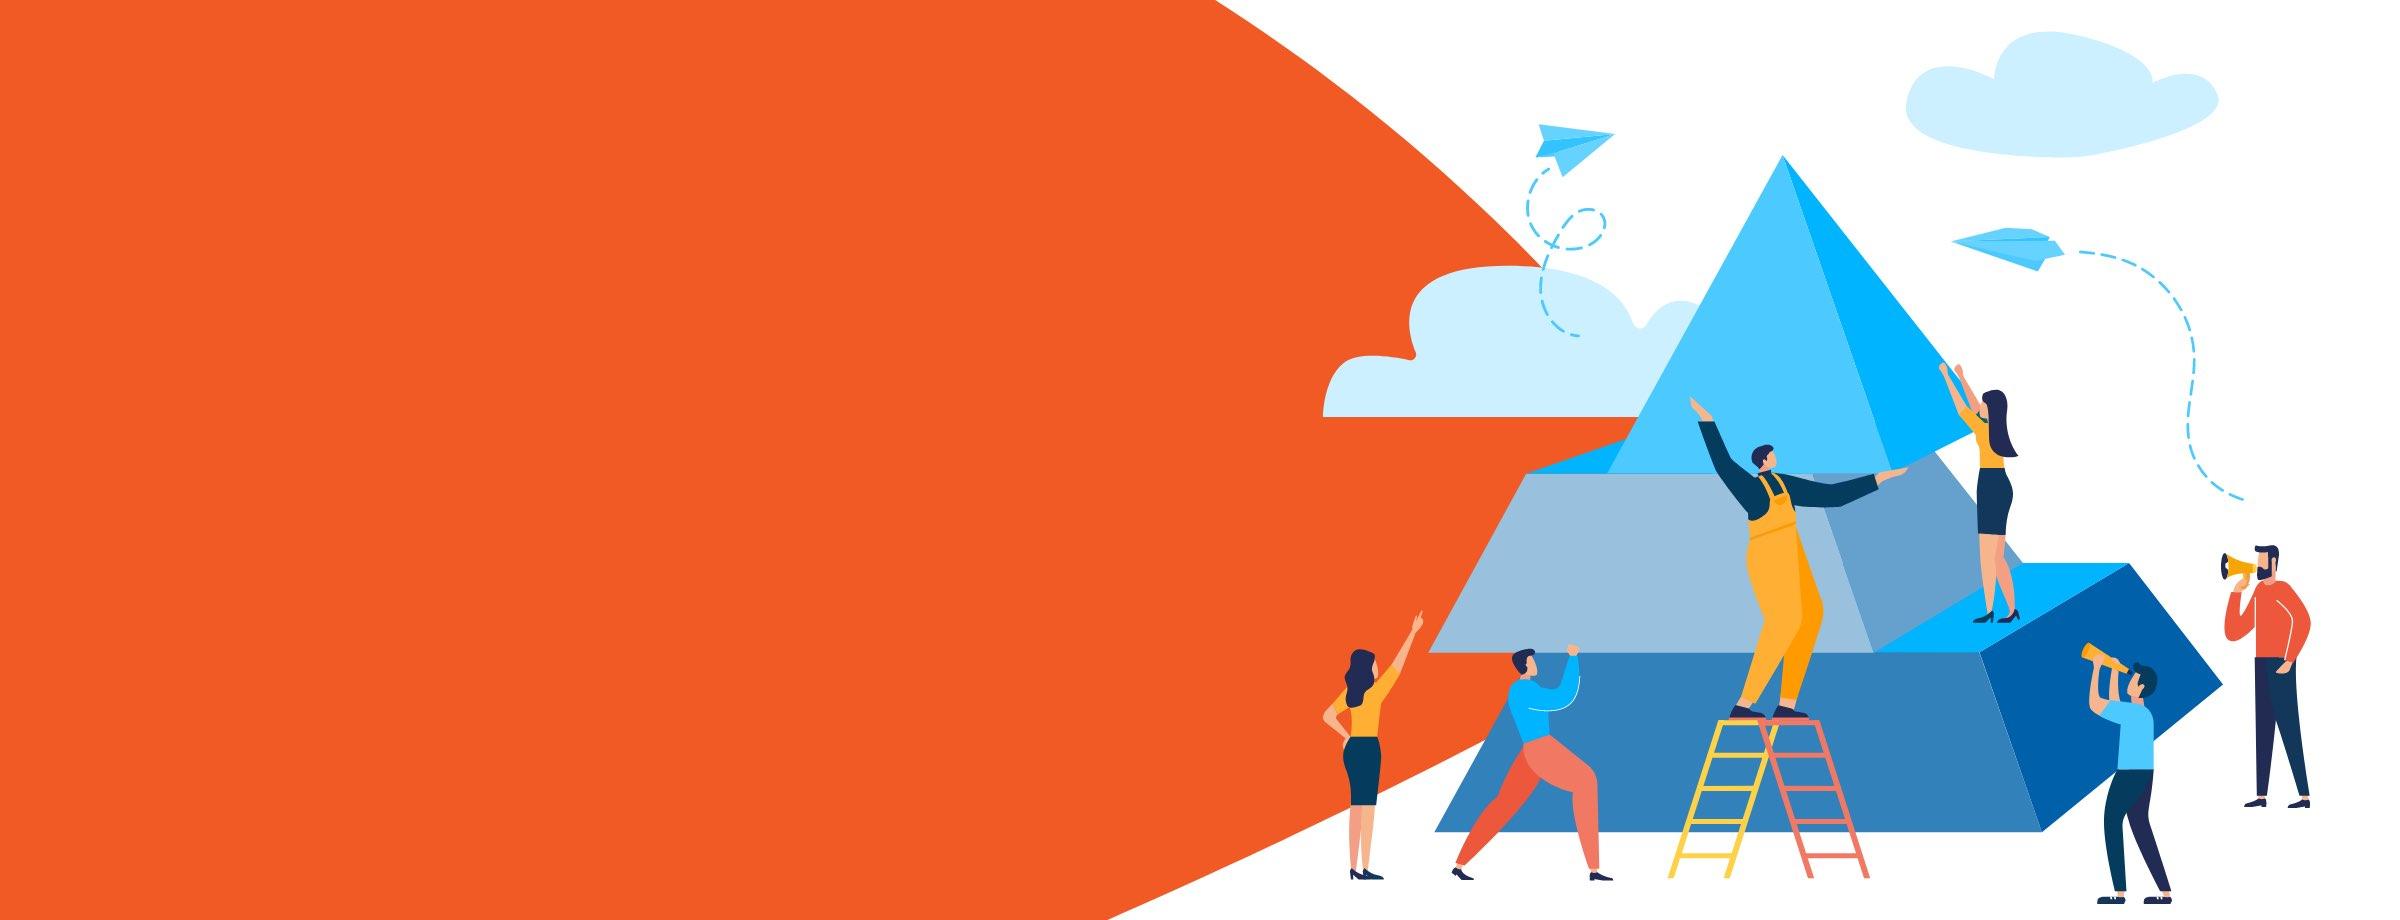 Why Sherweb has the best MSP partner program